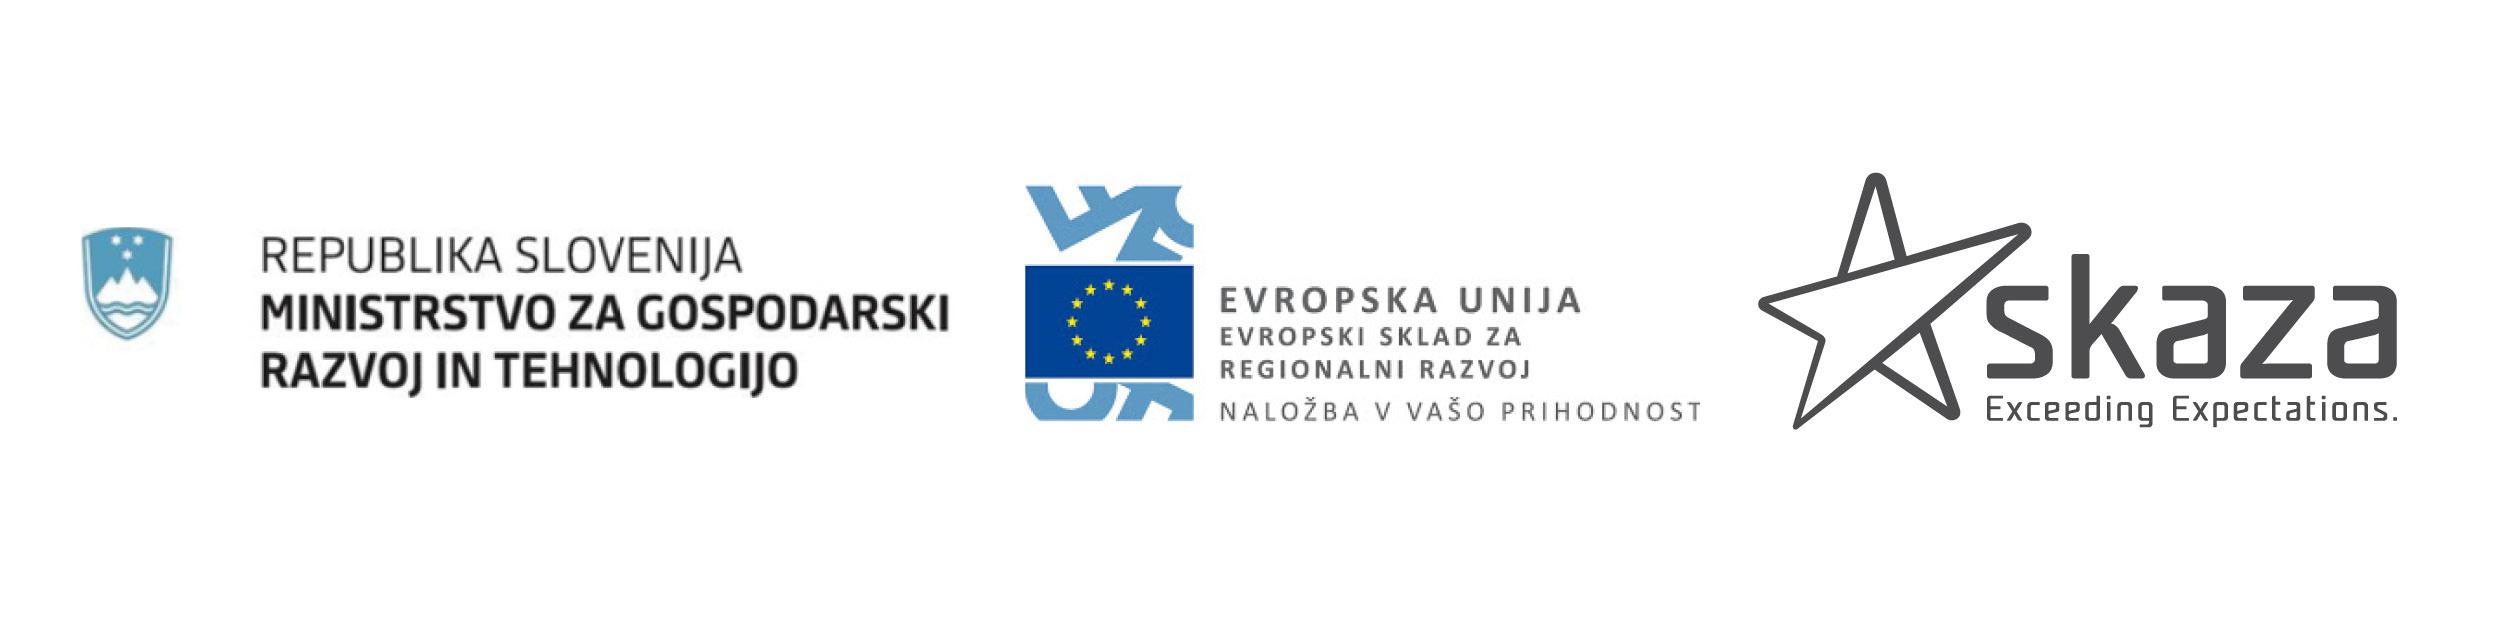 EU projects - biopack seed